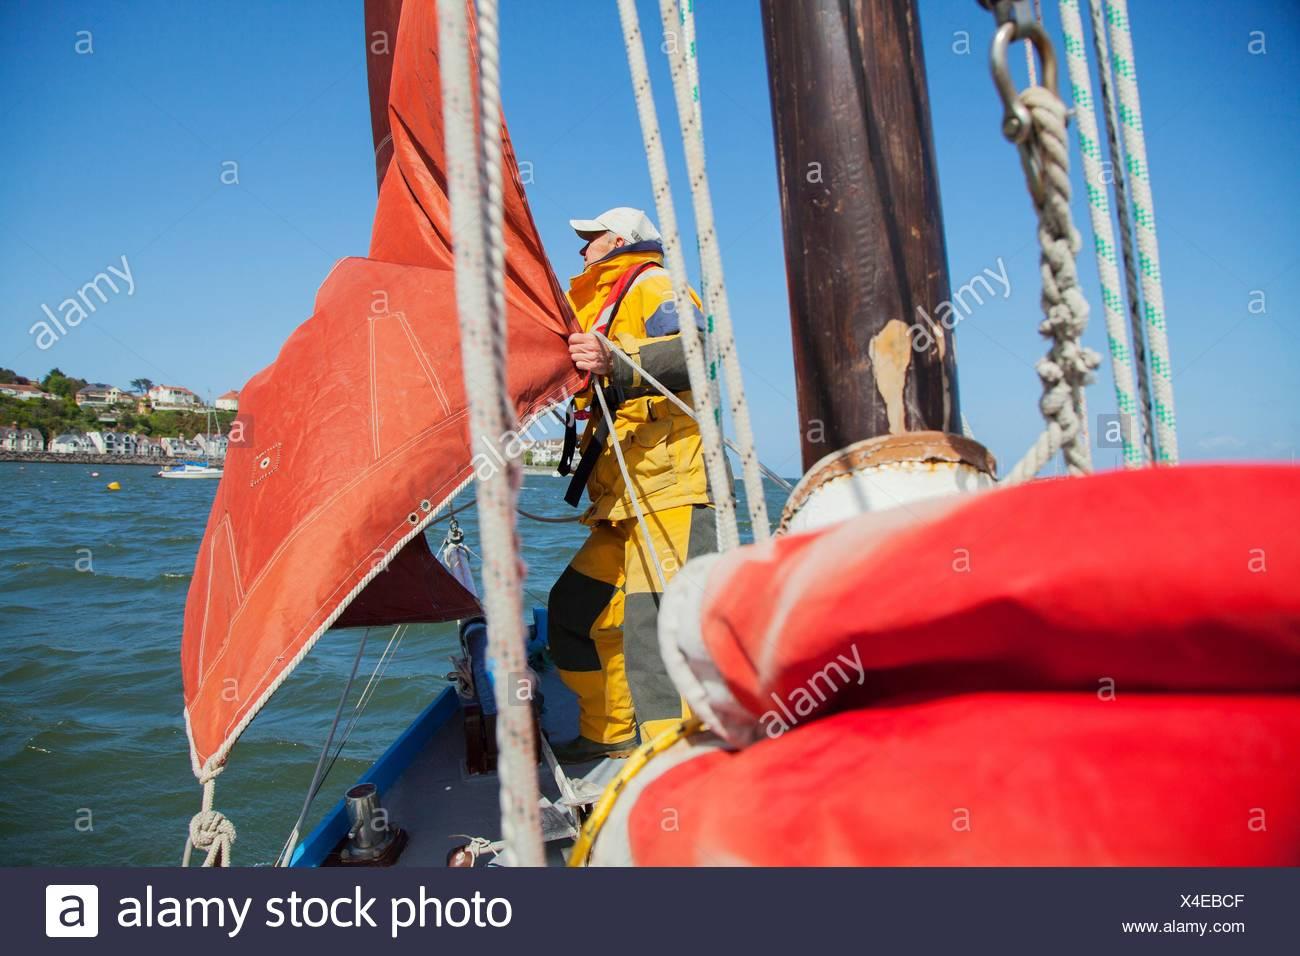 Senior man on sailing boat - Stock Image